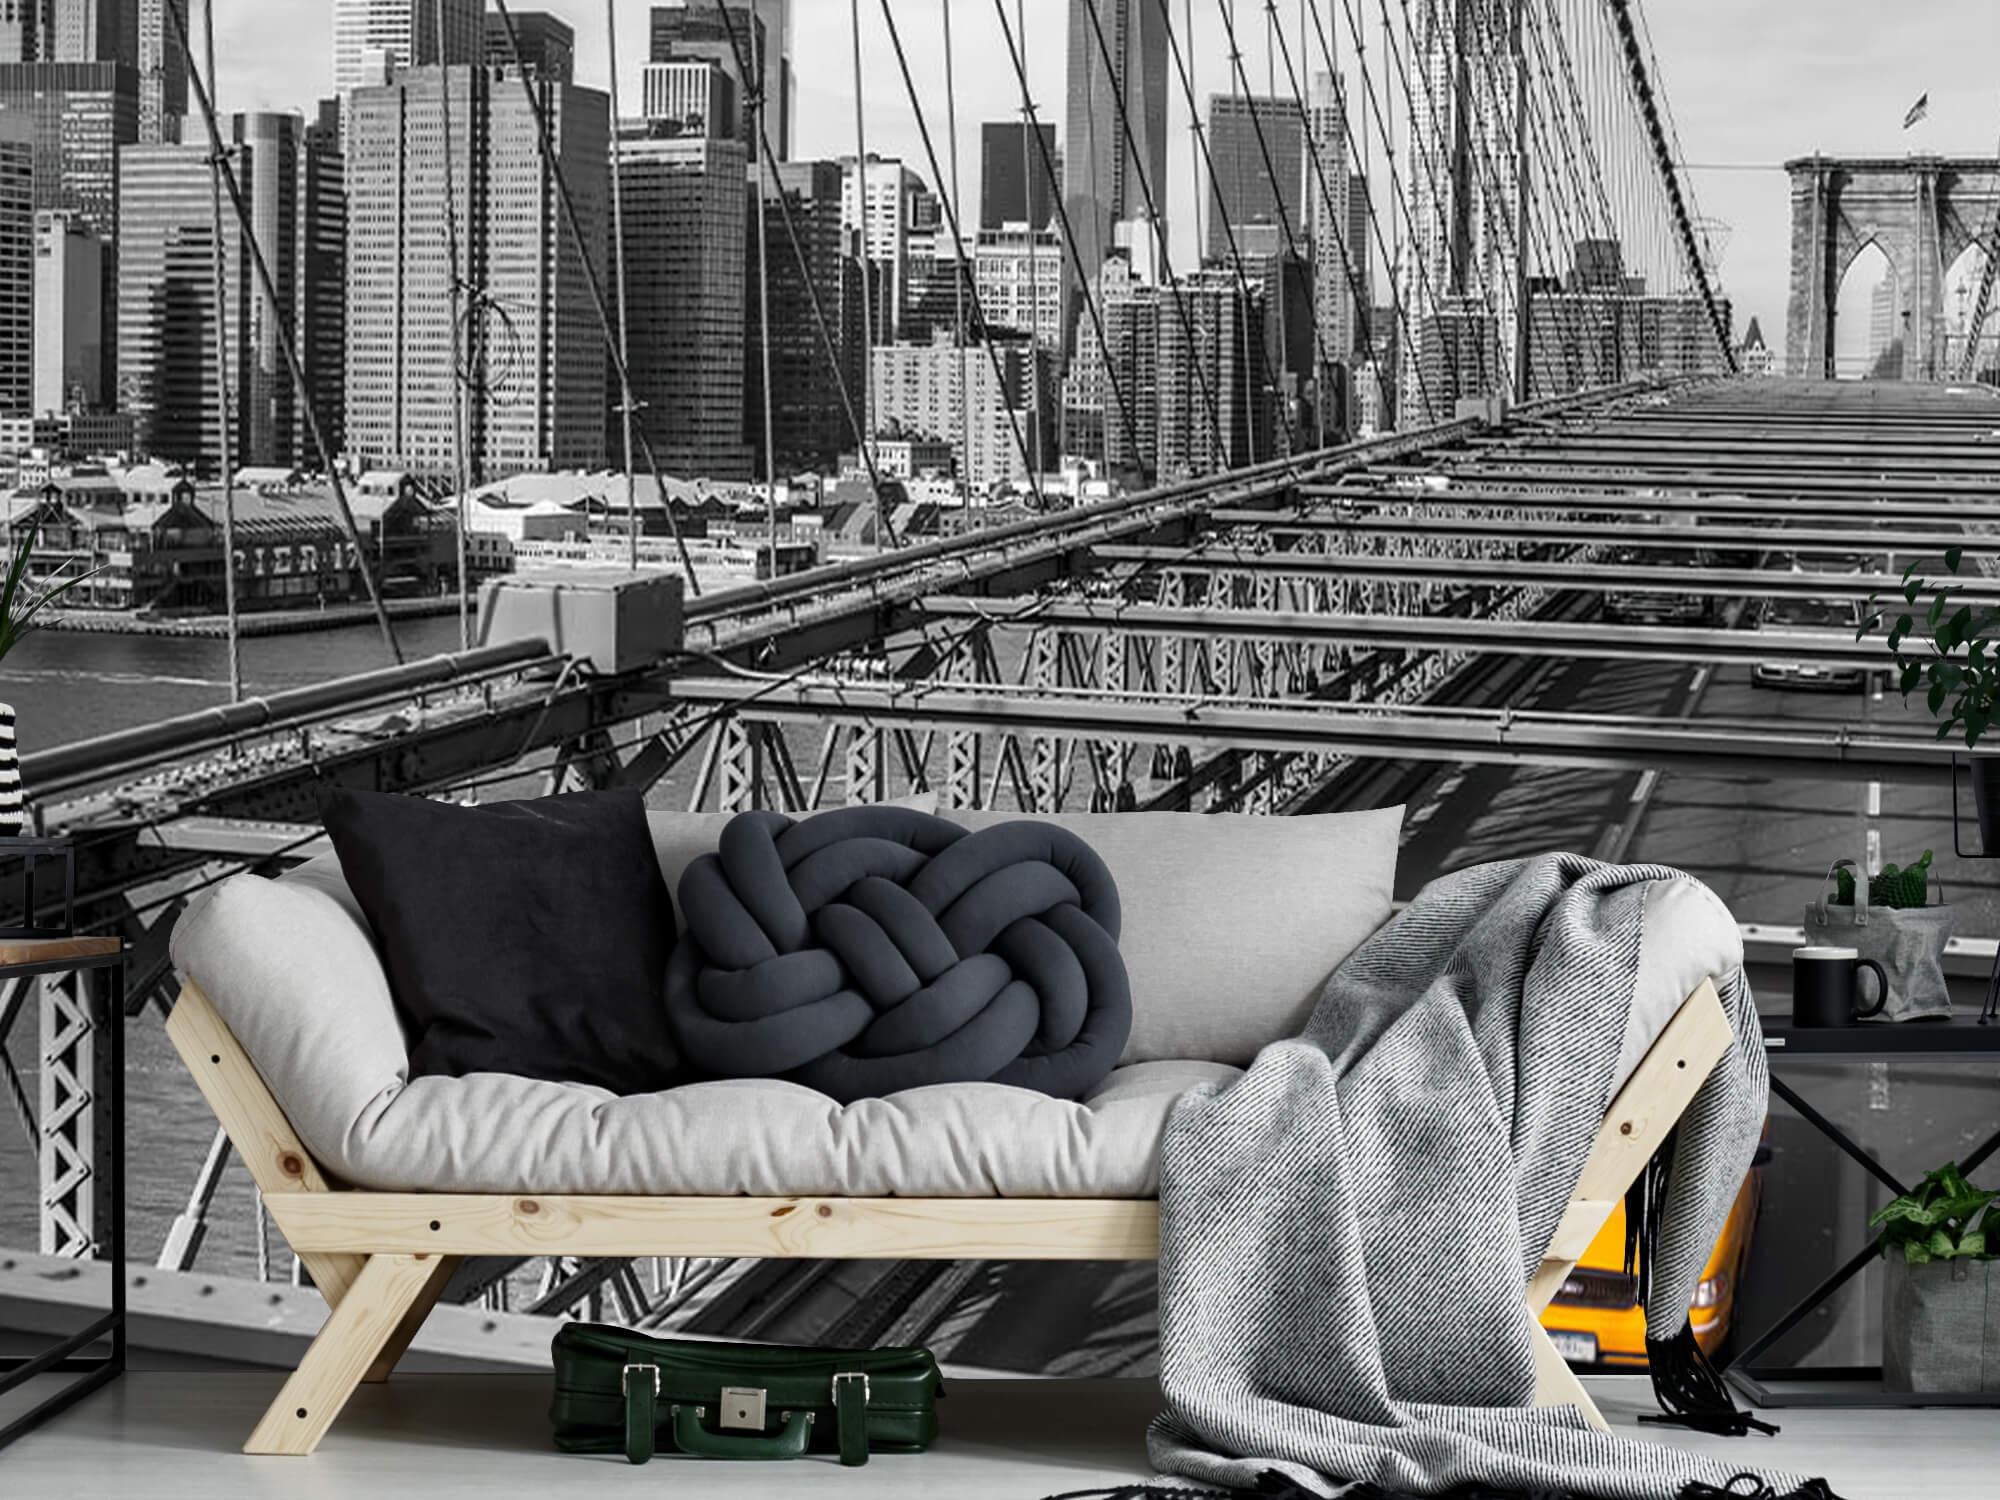 Un taxi sur le pont de Brooklyn 7